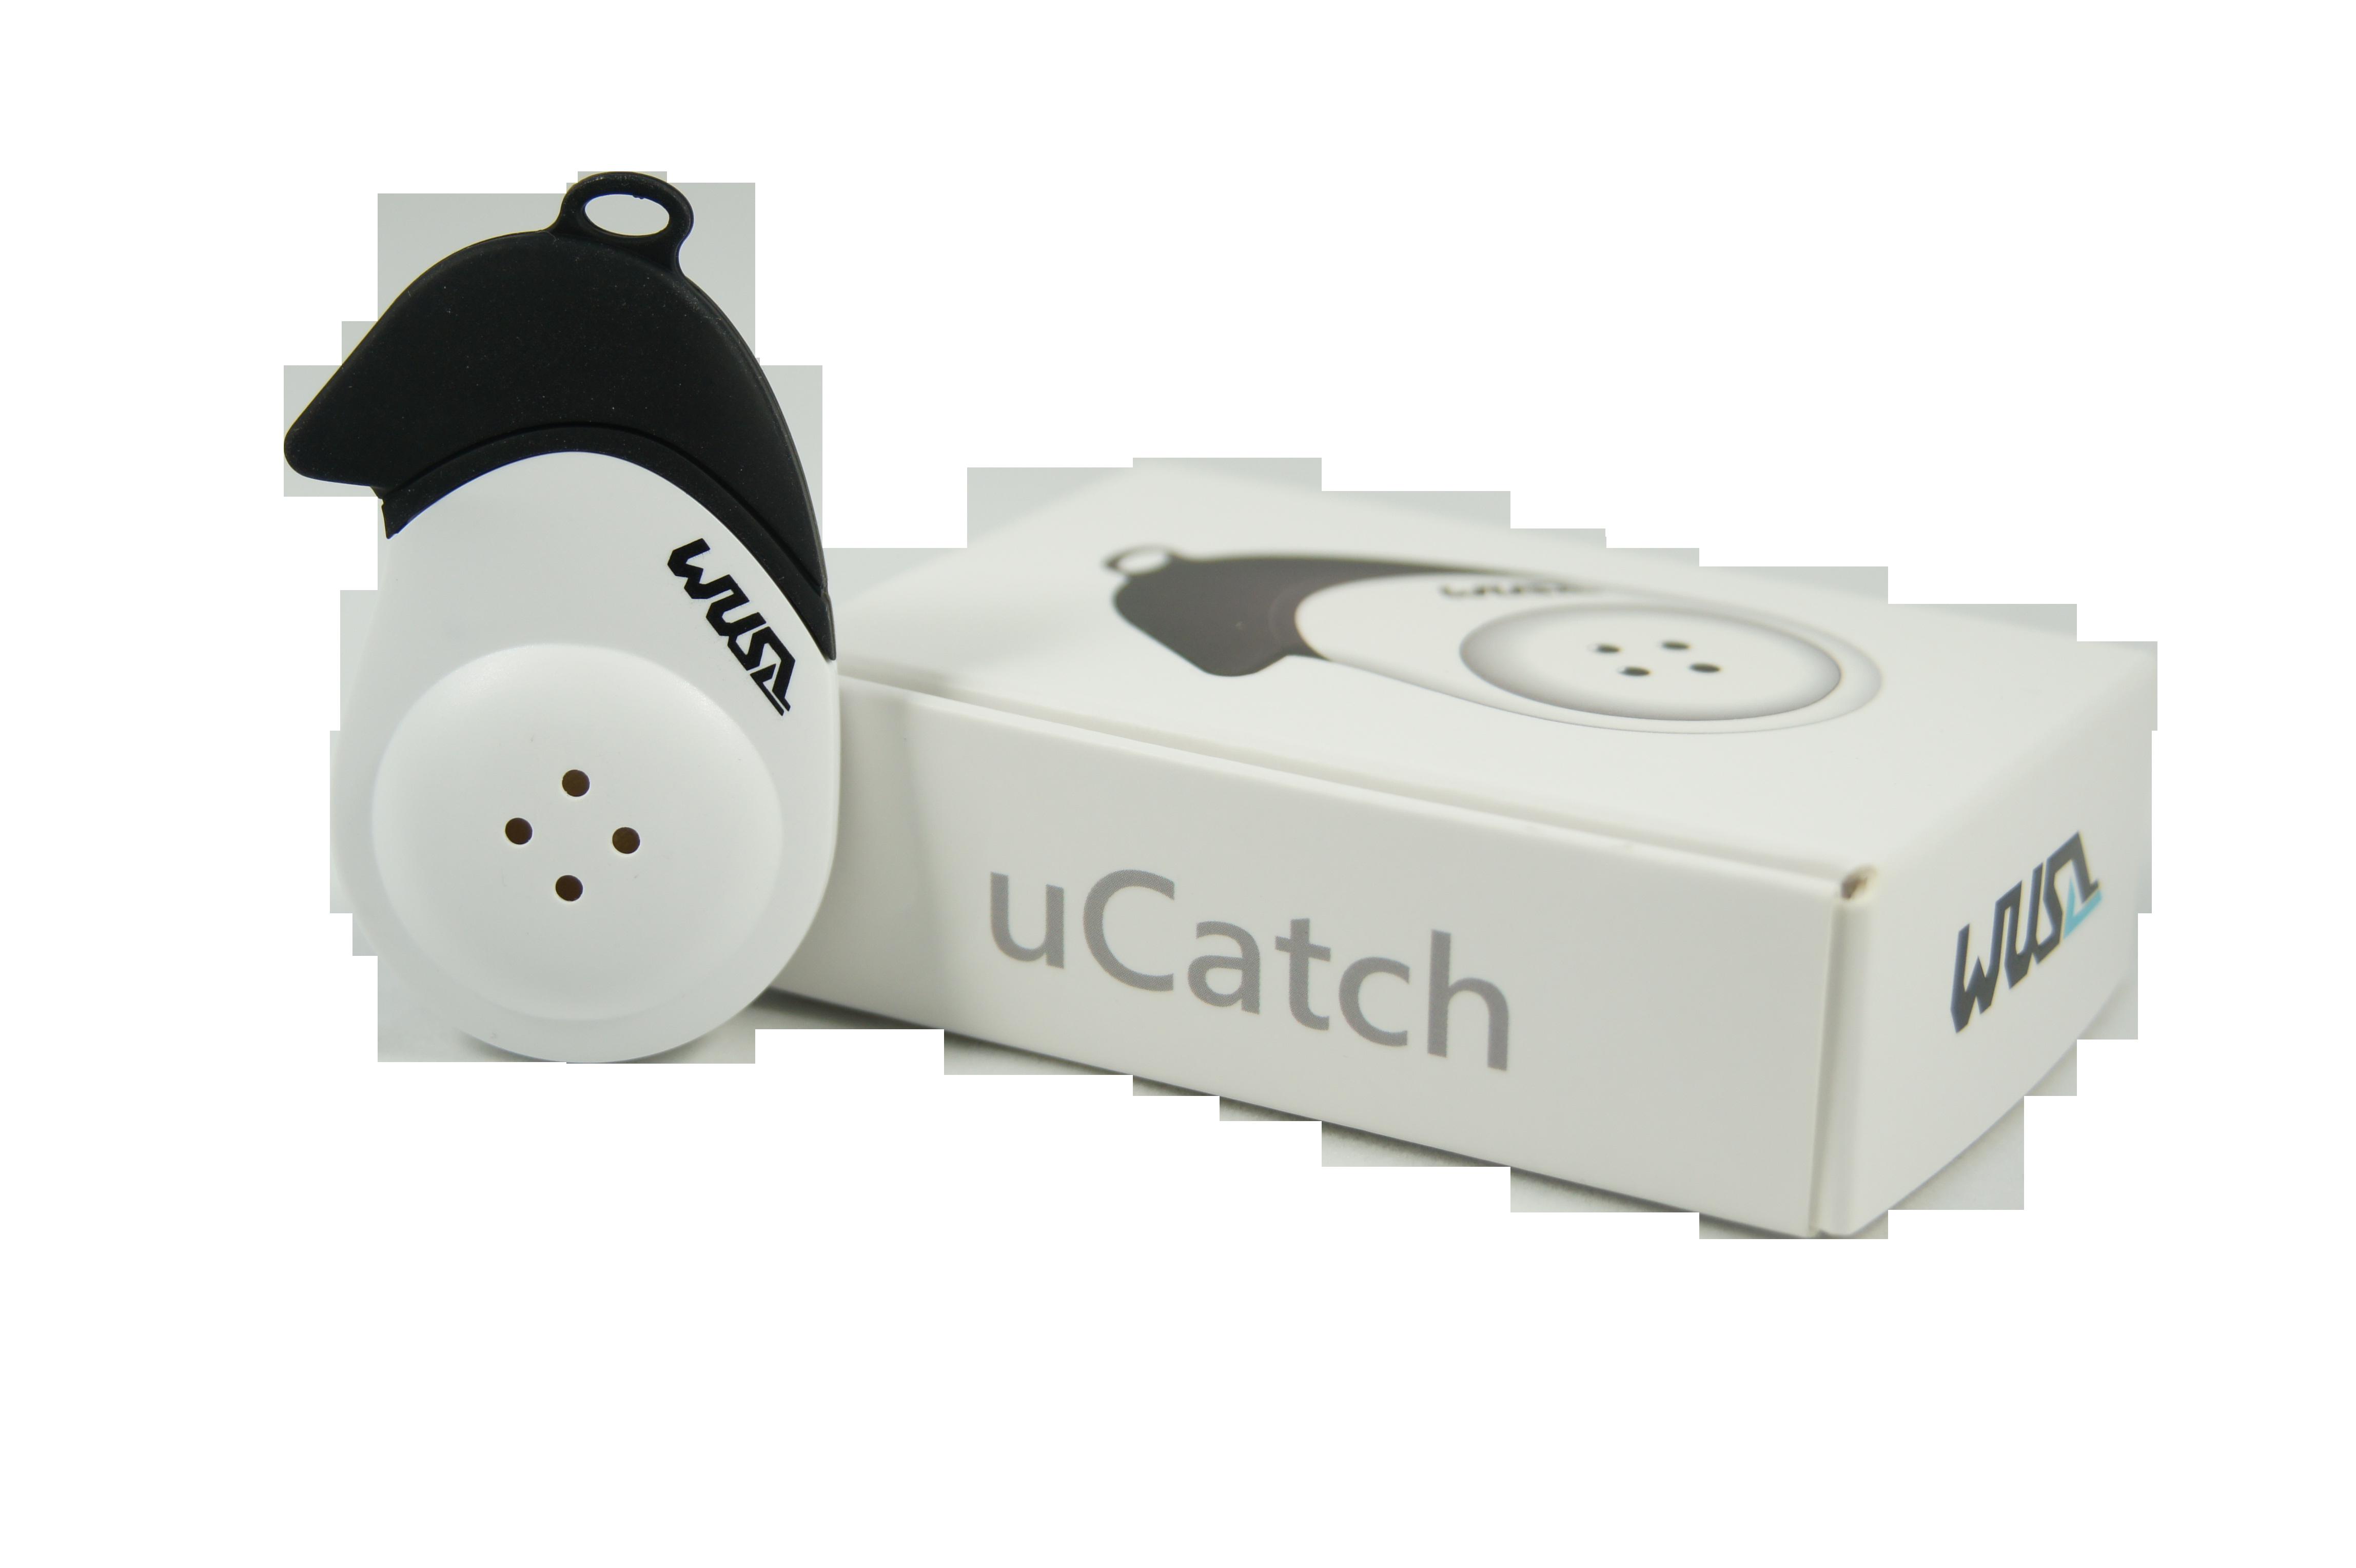 uCatch